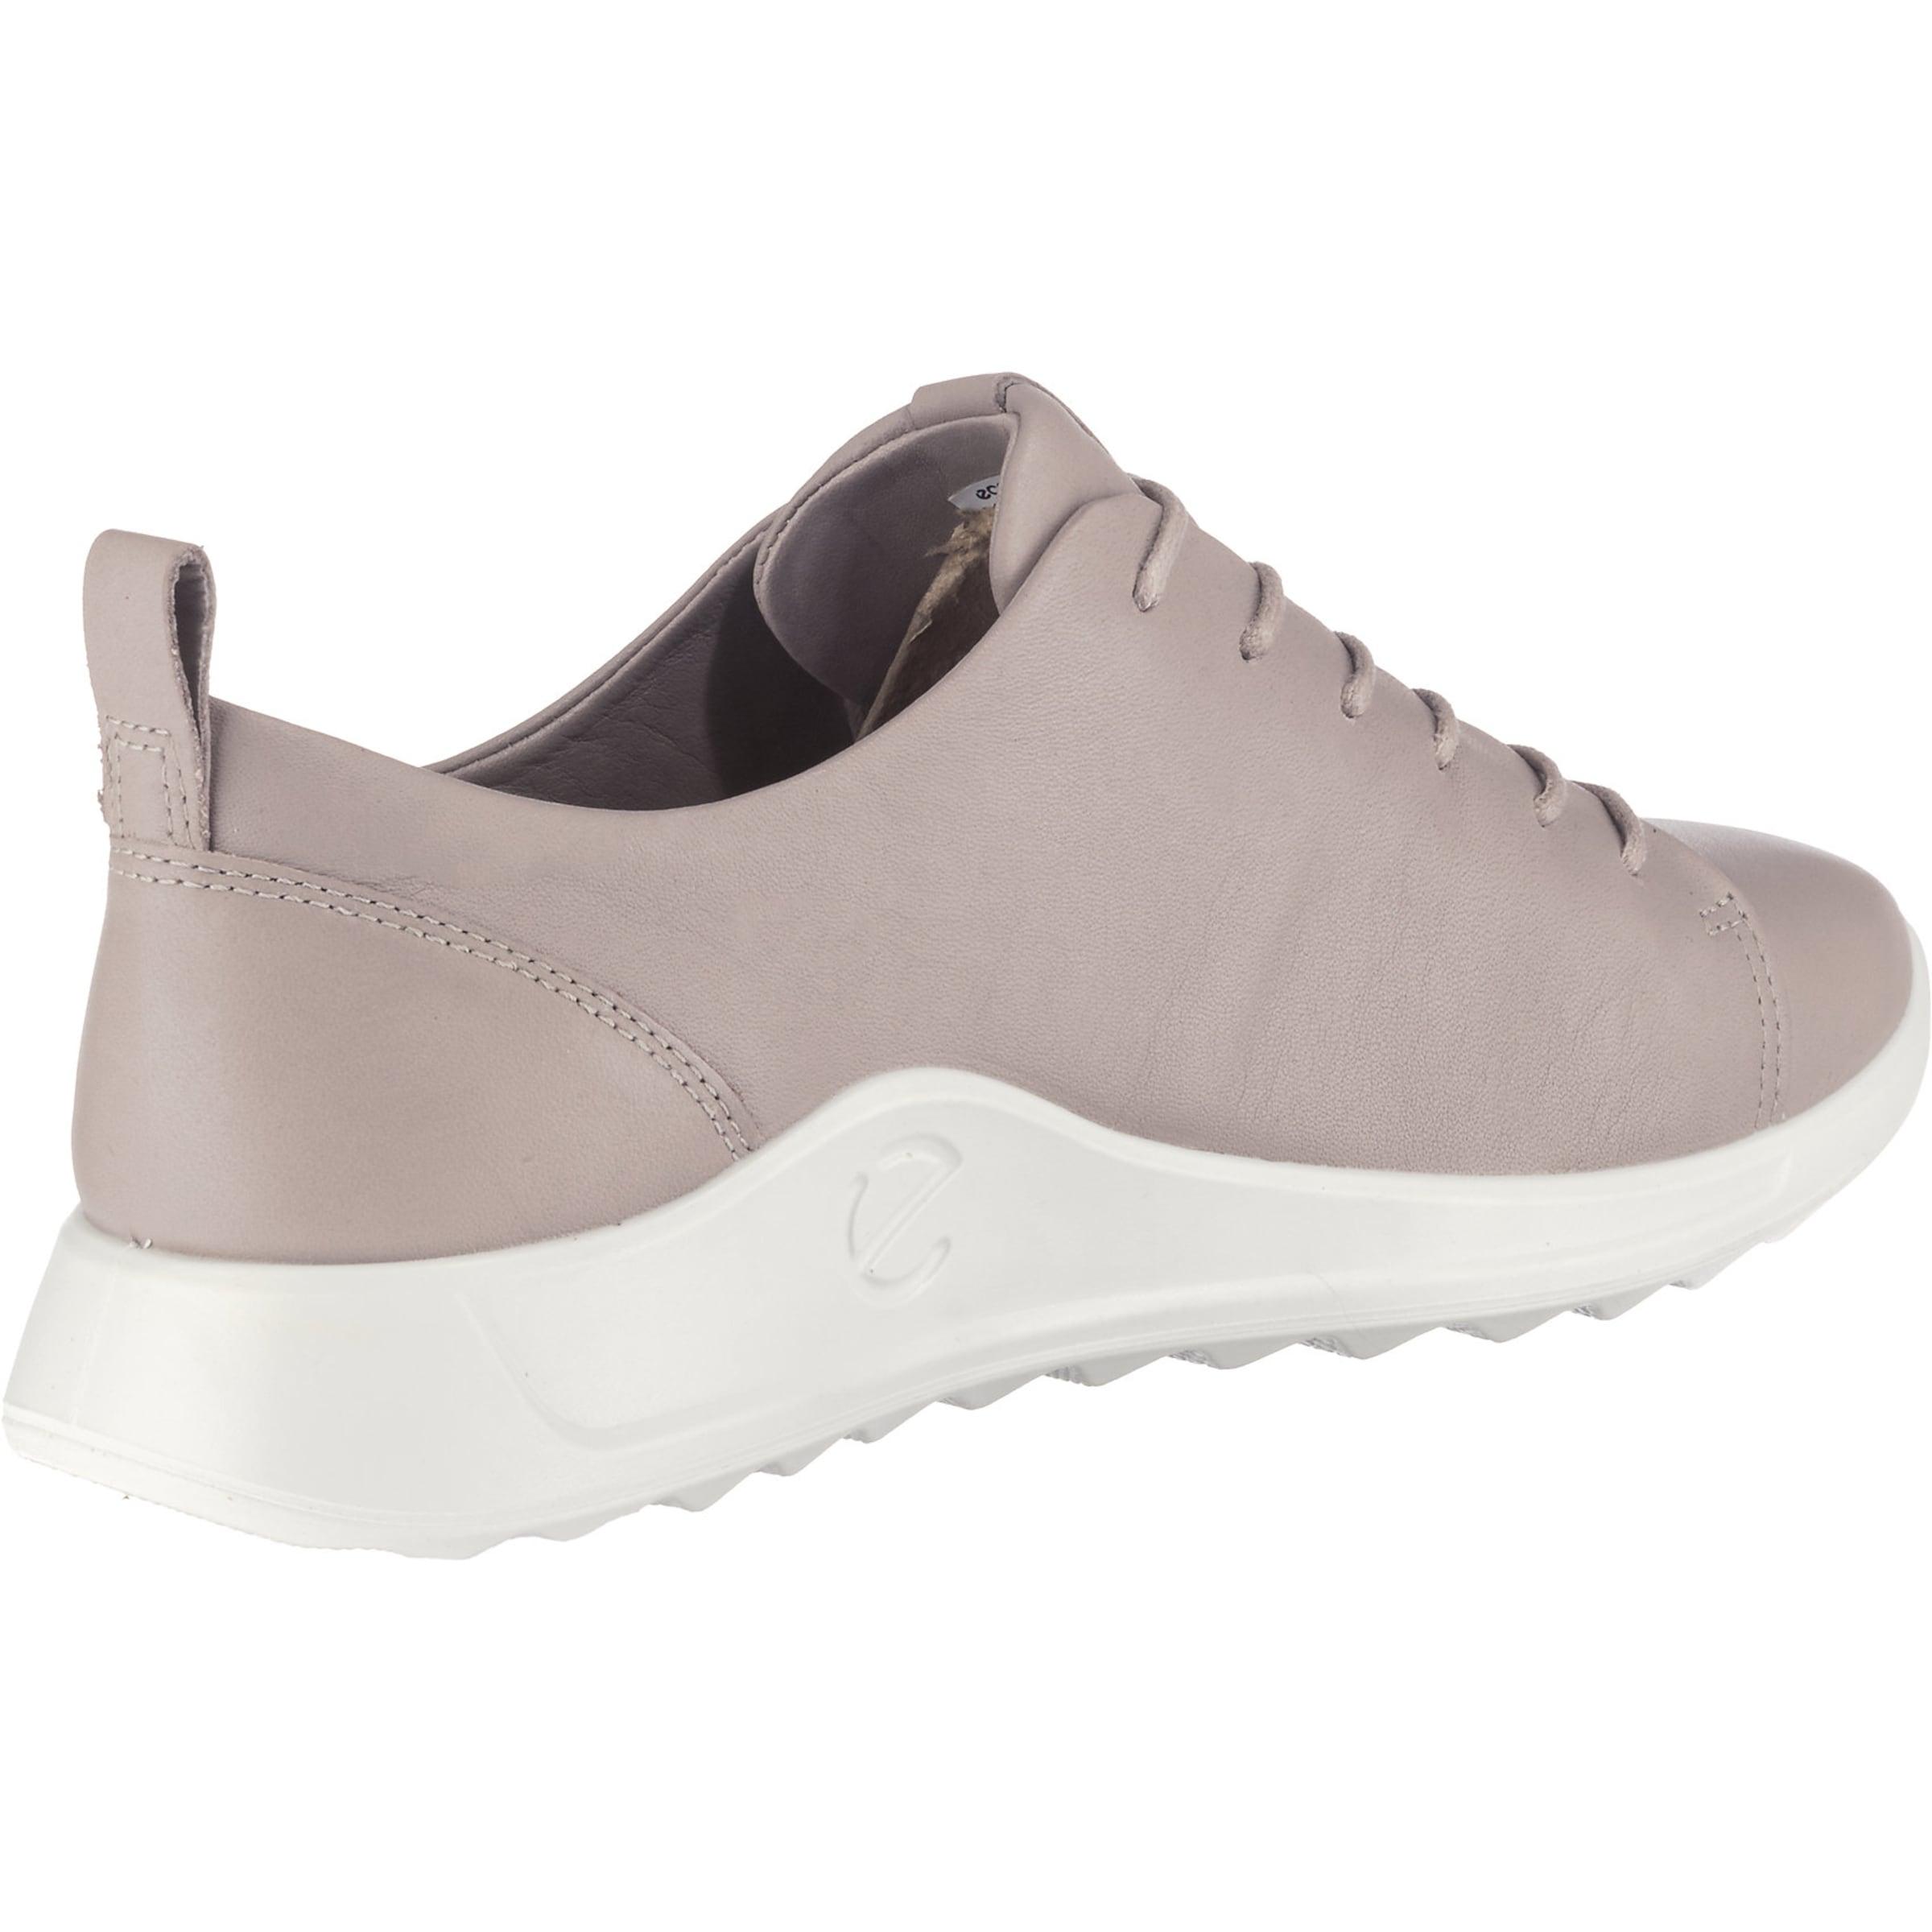 Sneakers Runner W' Pastelllila Ecco 'flexue In ulPZkXiwOT